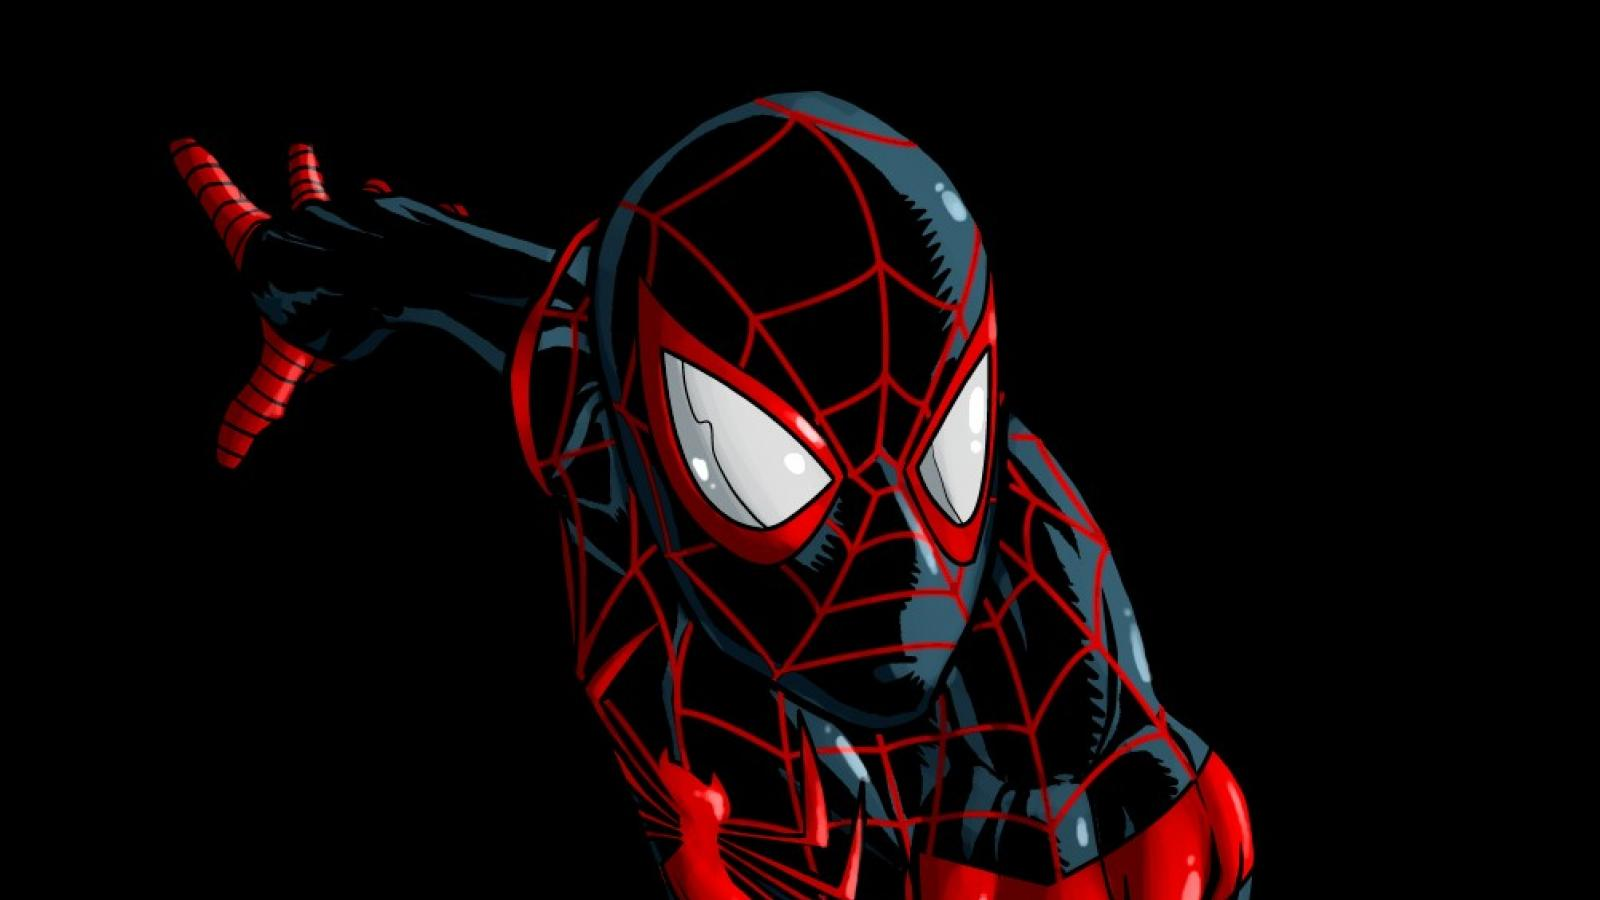 Ultimate spider man iphone wallpaper wallpapersafari - Spiderman iphone x wallpaper ...